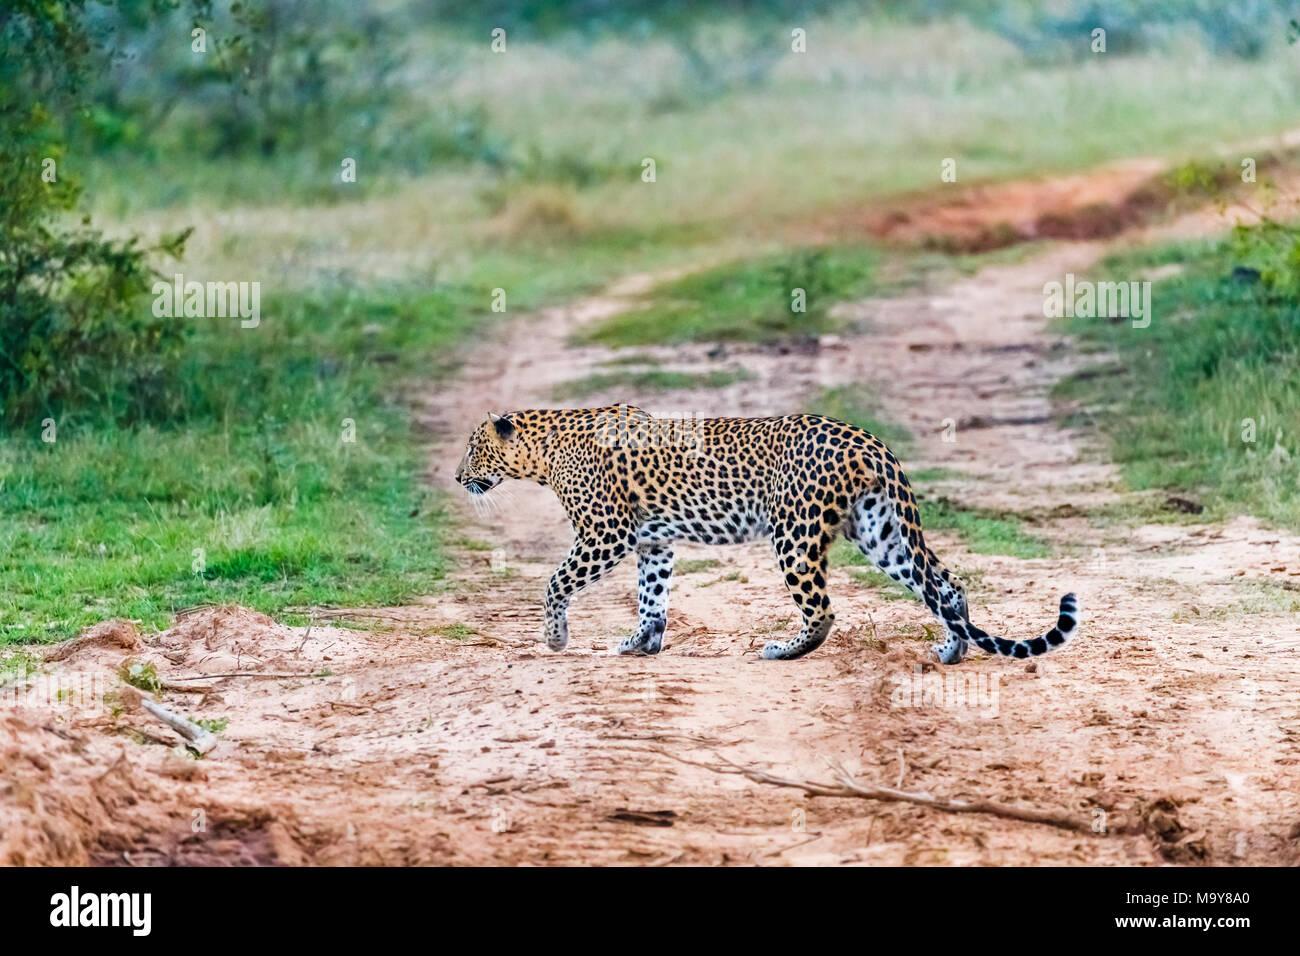 Female leopard (Panthera pardus) walking across a track looking back, Kumana National Park, Eastern Province, Sri Lanka - Stock Image